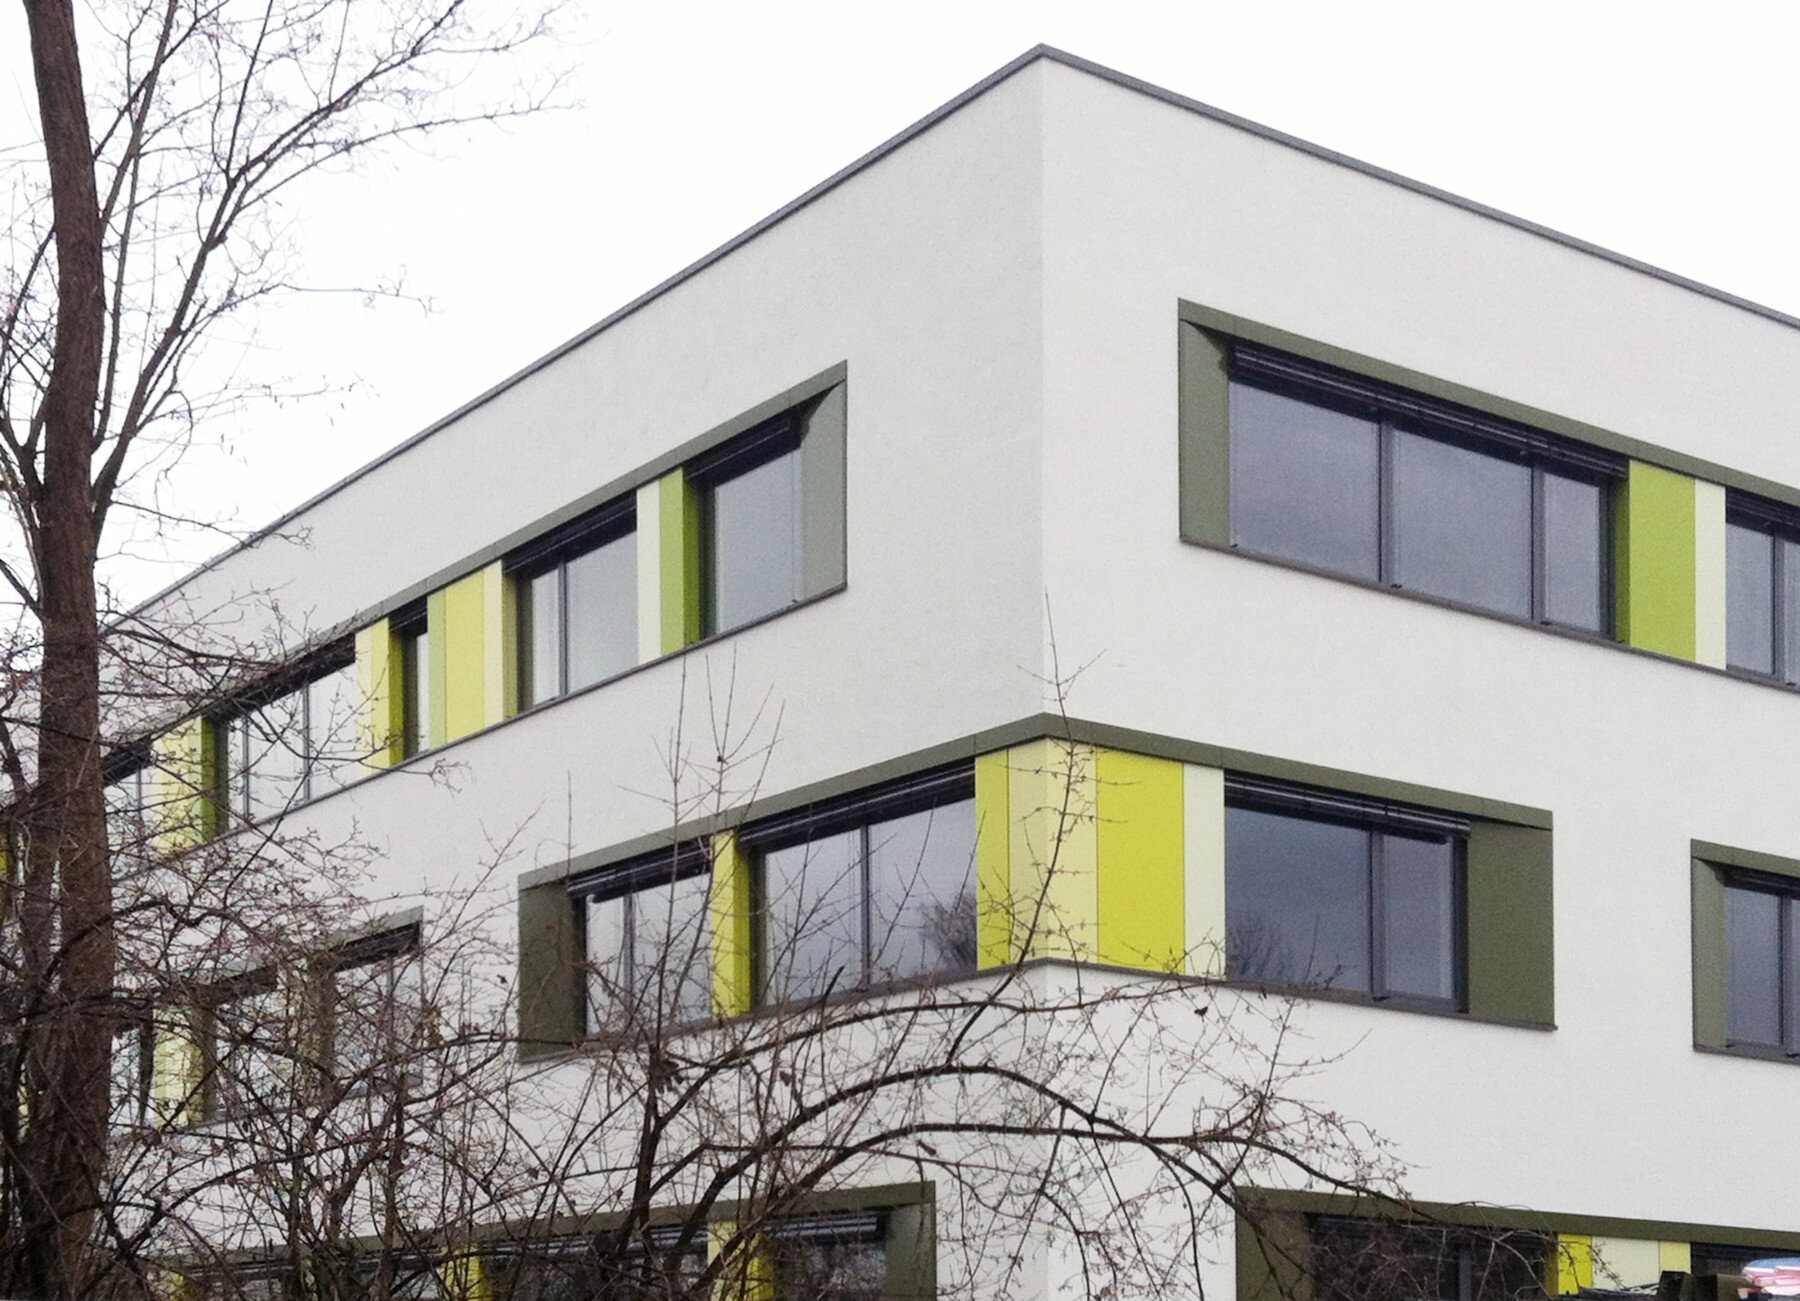 Gebrüder-Asam-Mittelschule